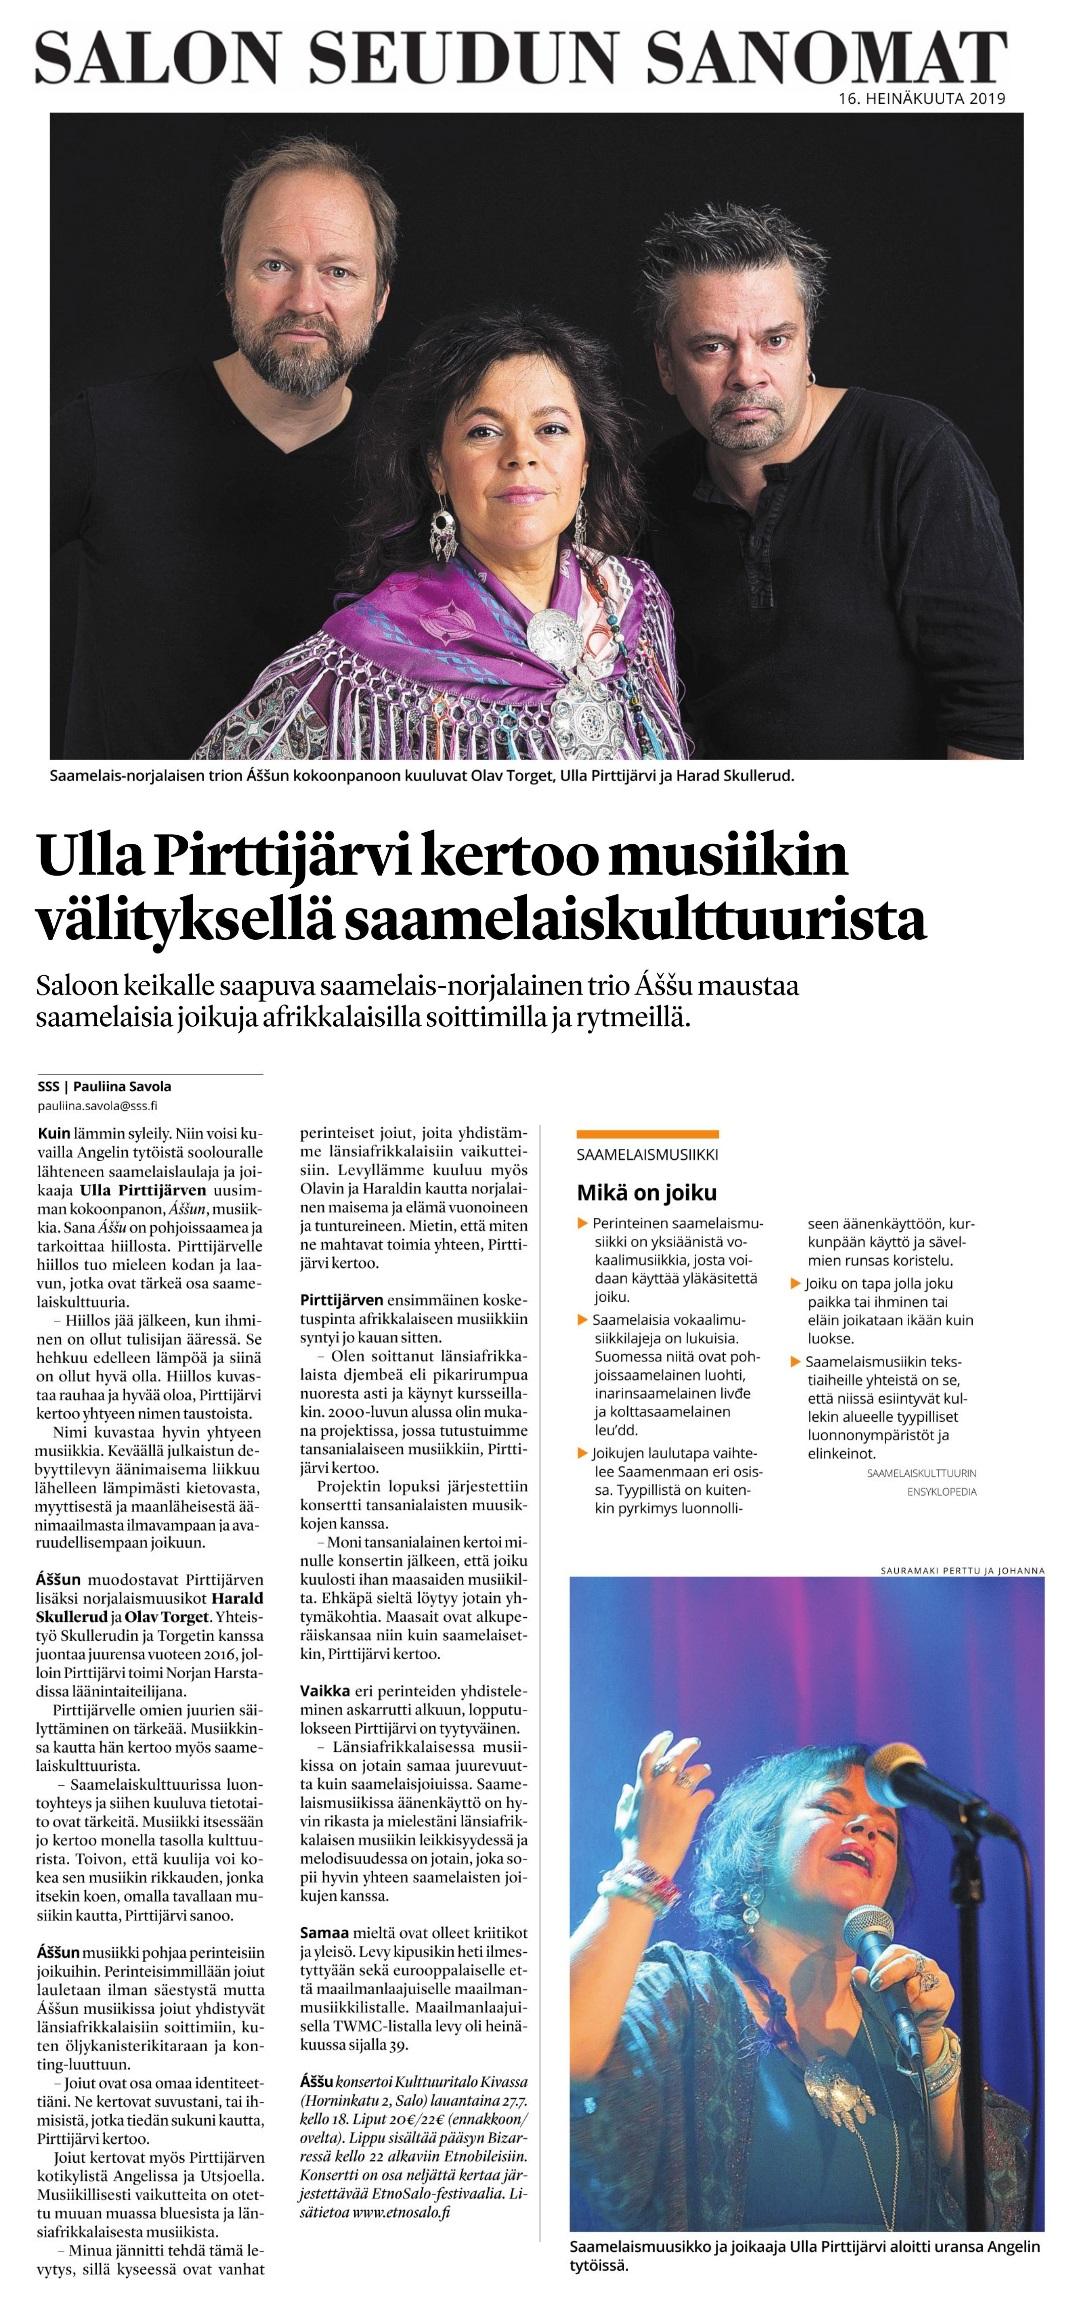 Salon Seudun Sanomat (Finland), 16.7.2019